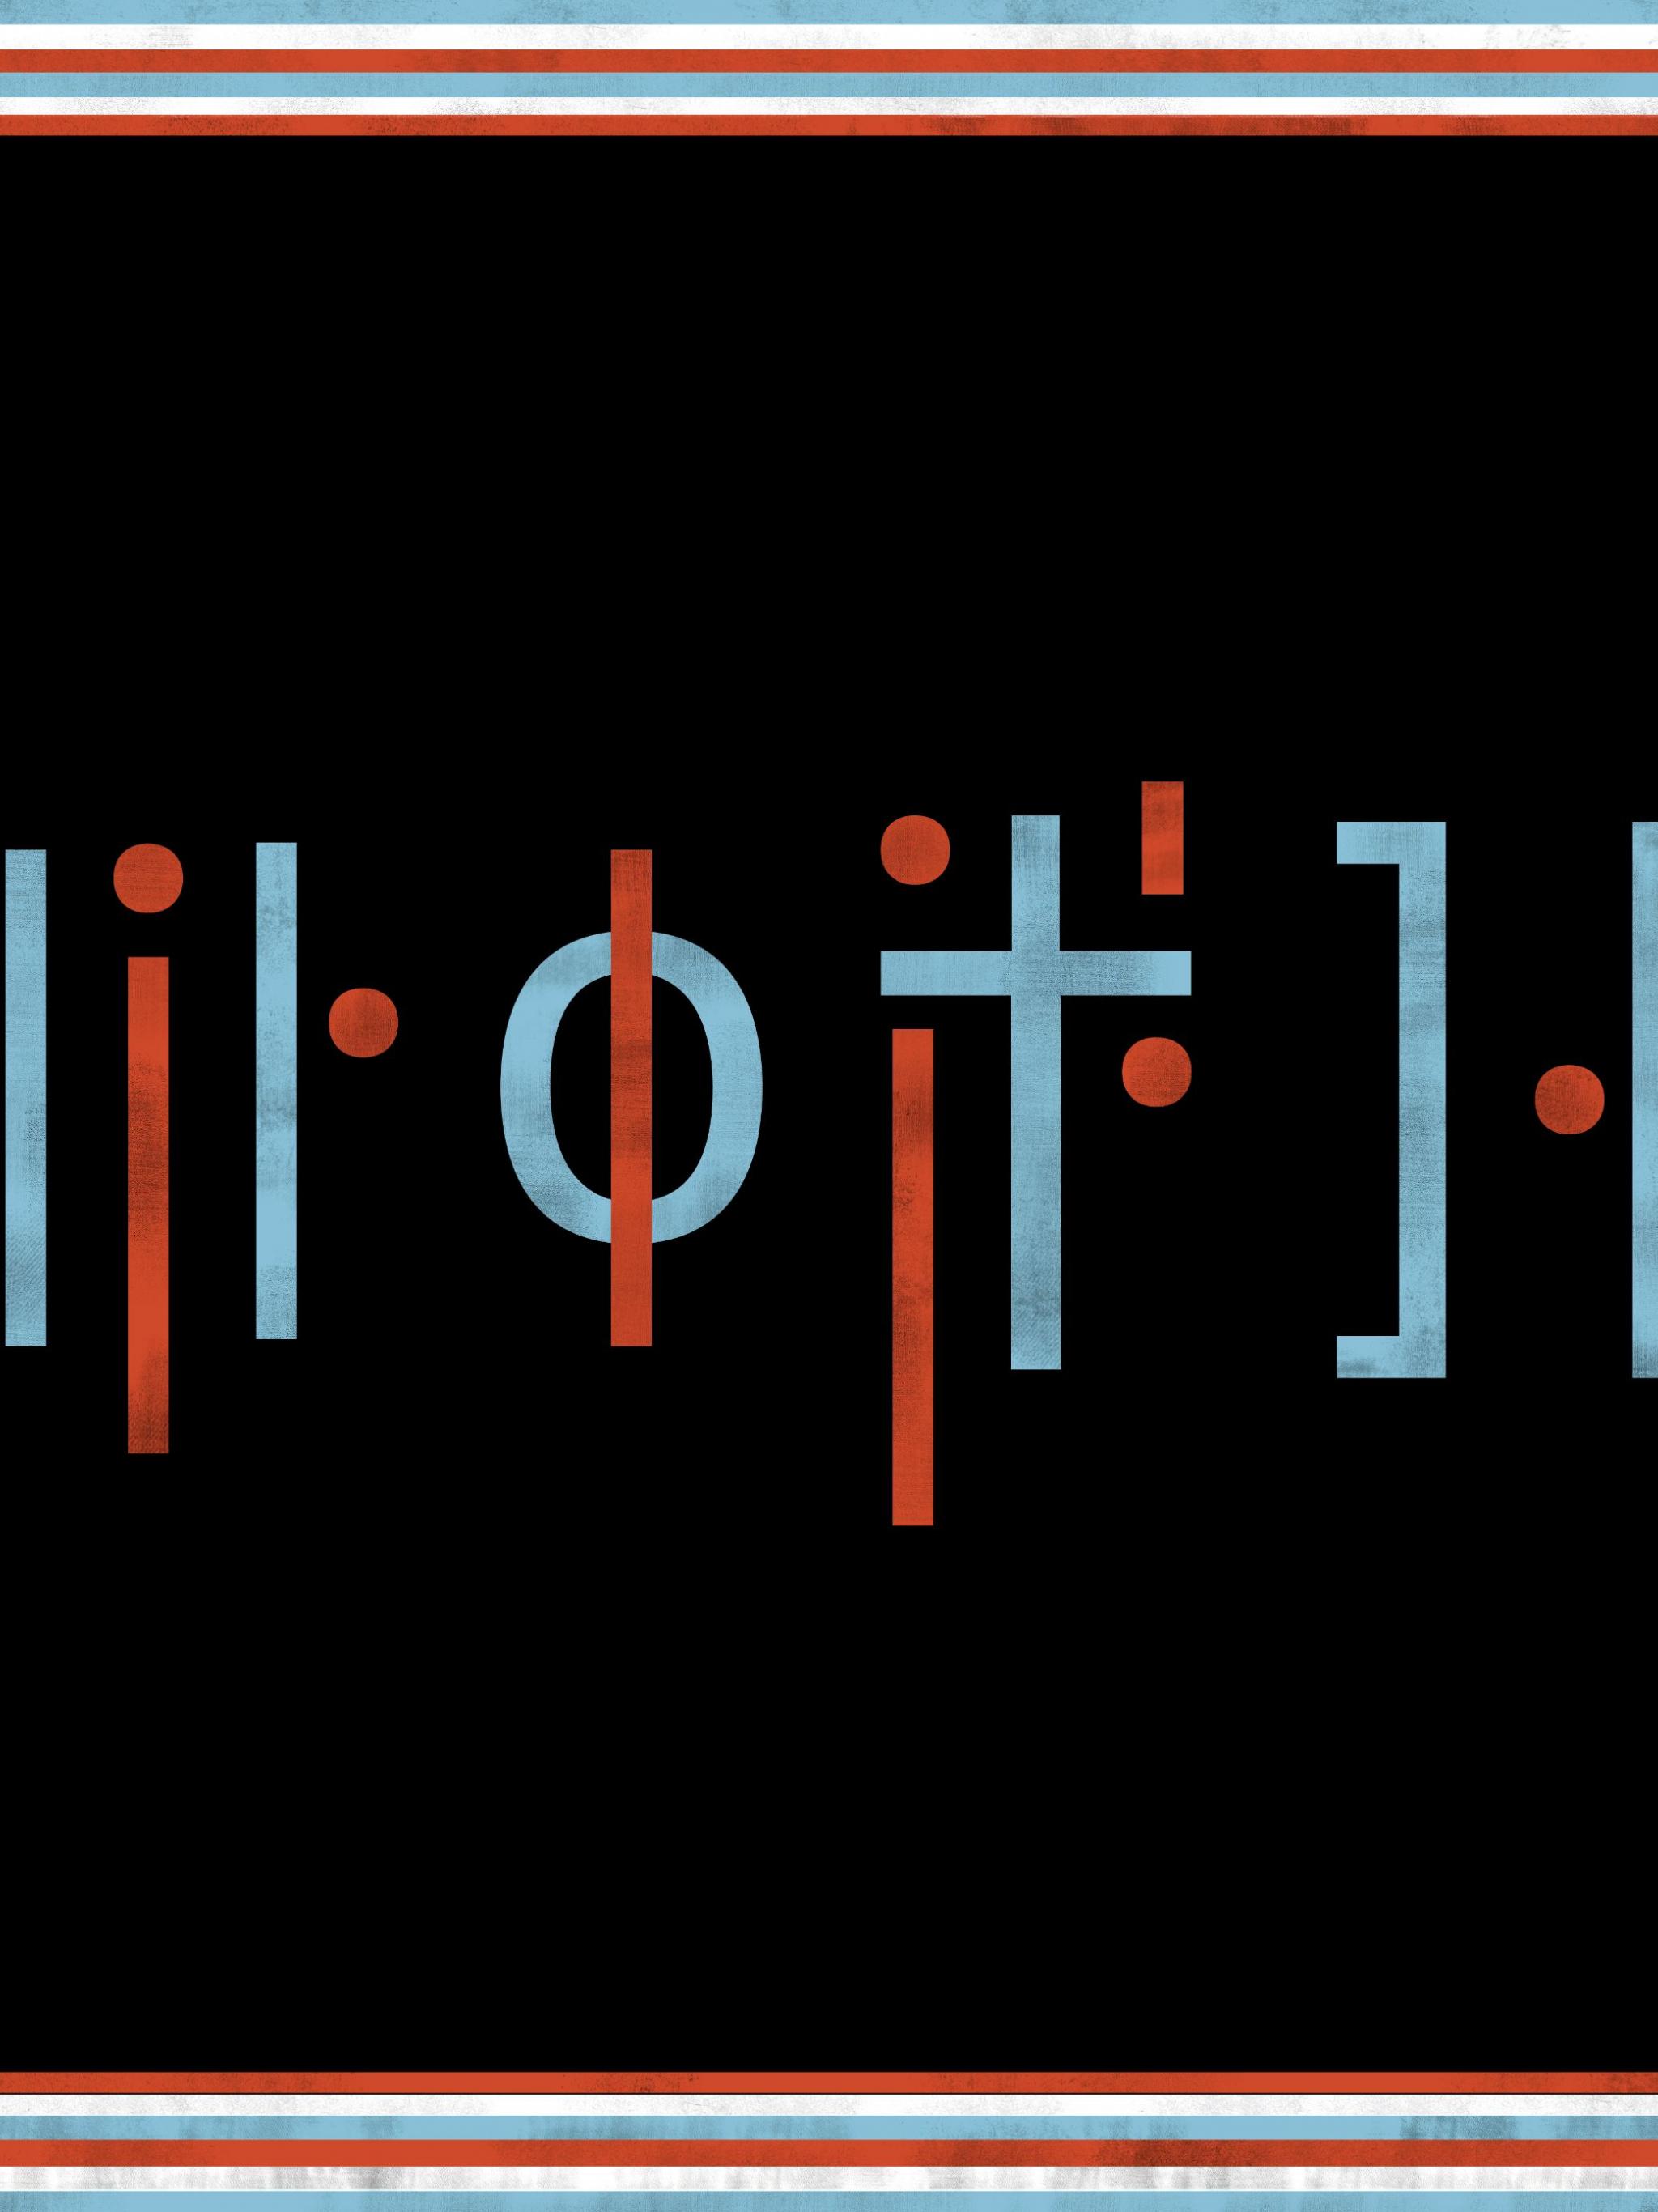 Free Download Twenty One Pilots Logo Car Tuning 3935x2775 For